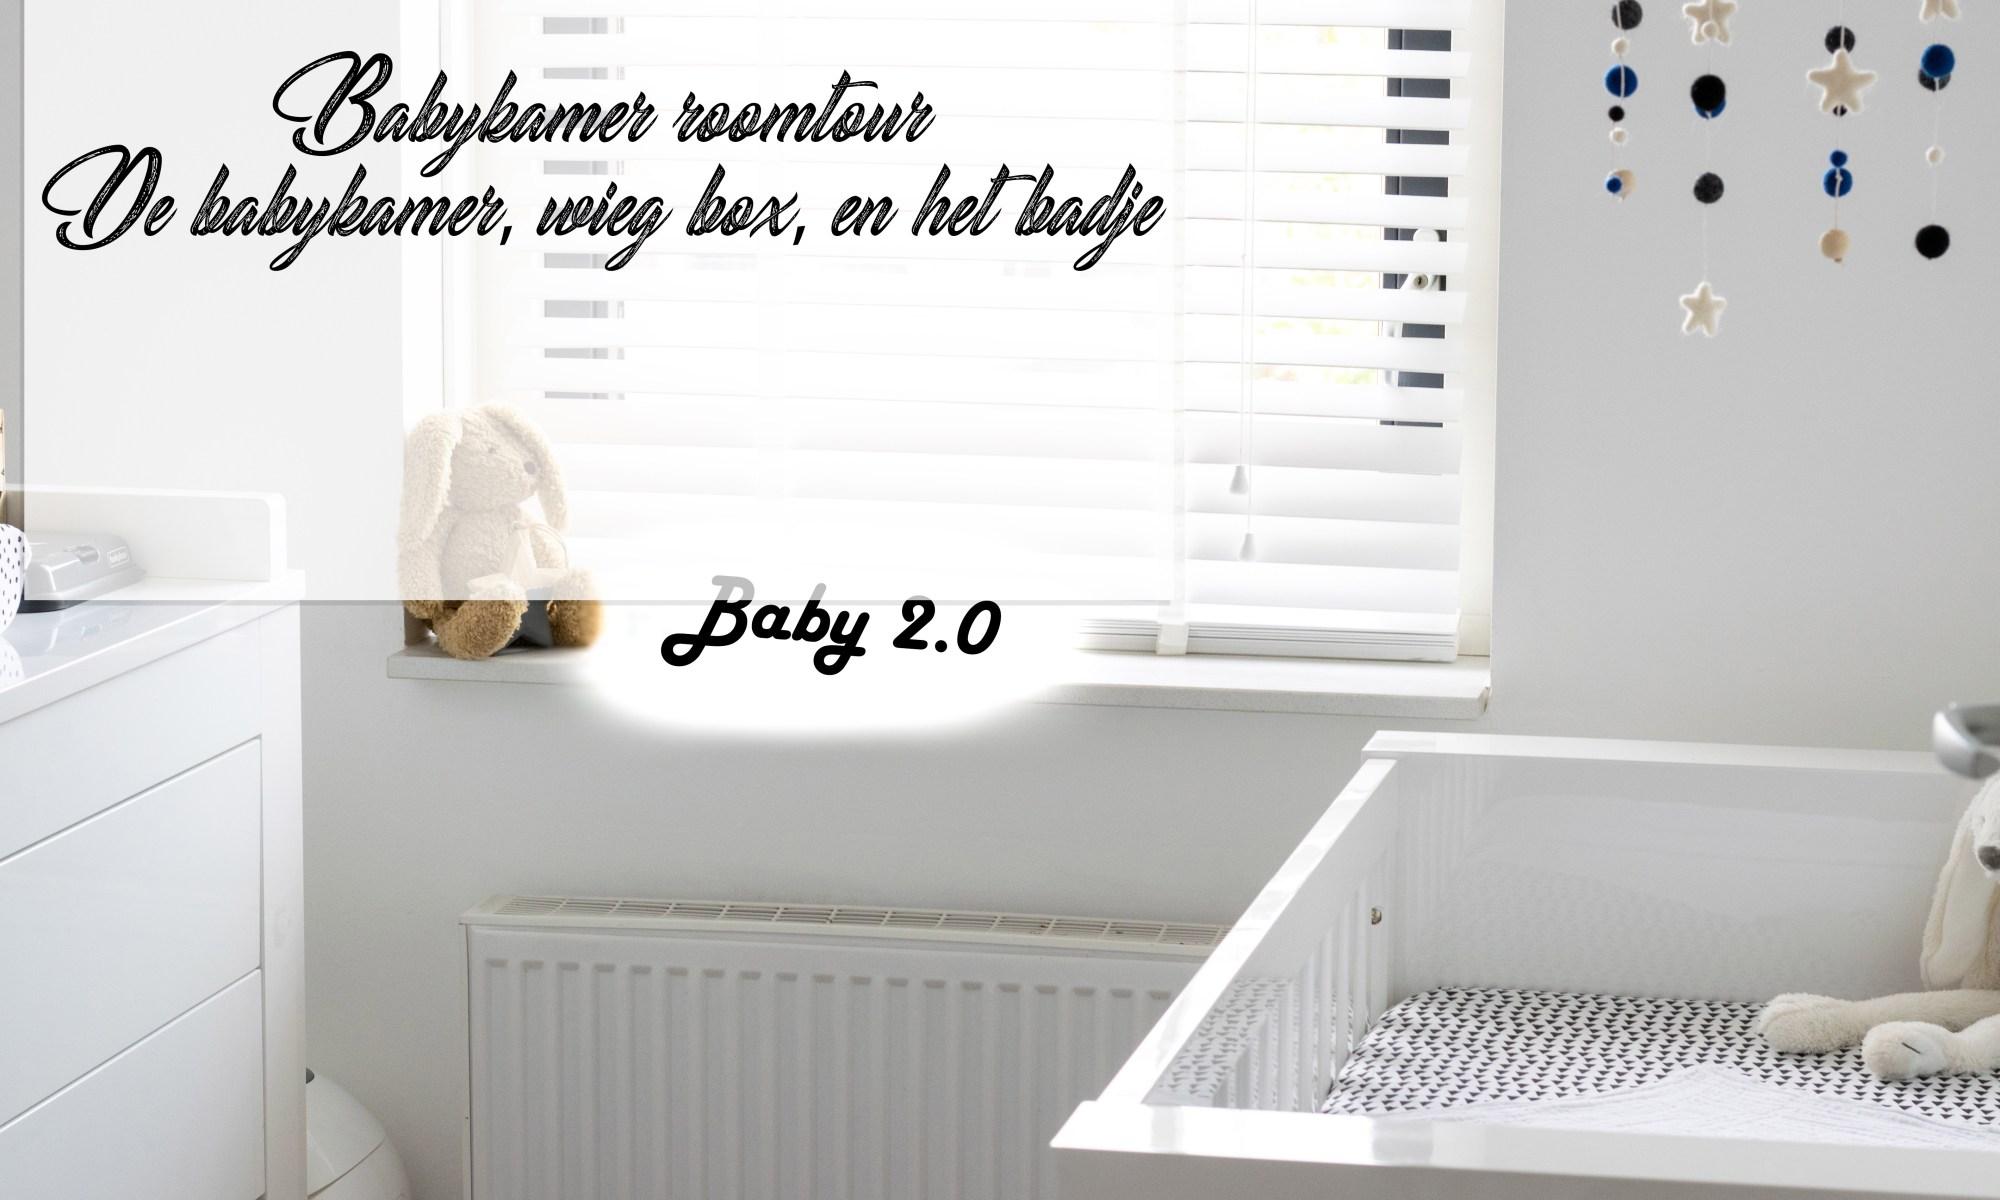 Babykamer baby kamer roomtour rondleiding tweede kindje box wieg ledikant wit monochrome hout stoer mama blog brandrep www.liefkleinwonder.nl